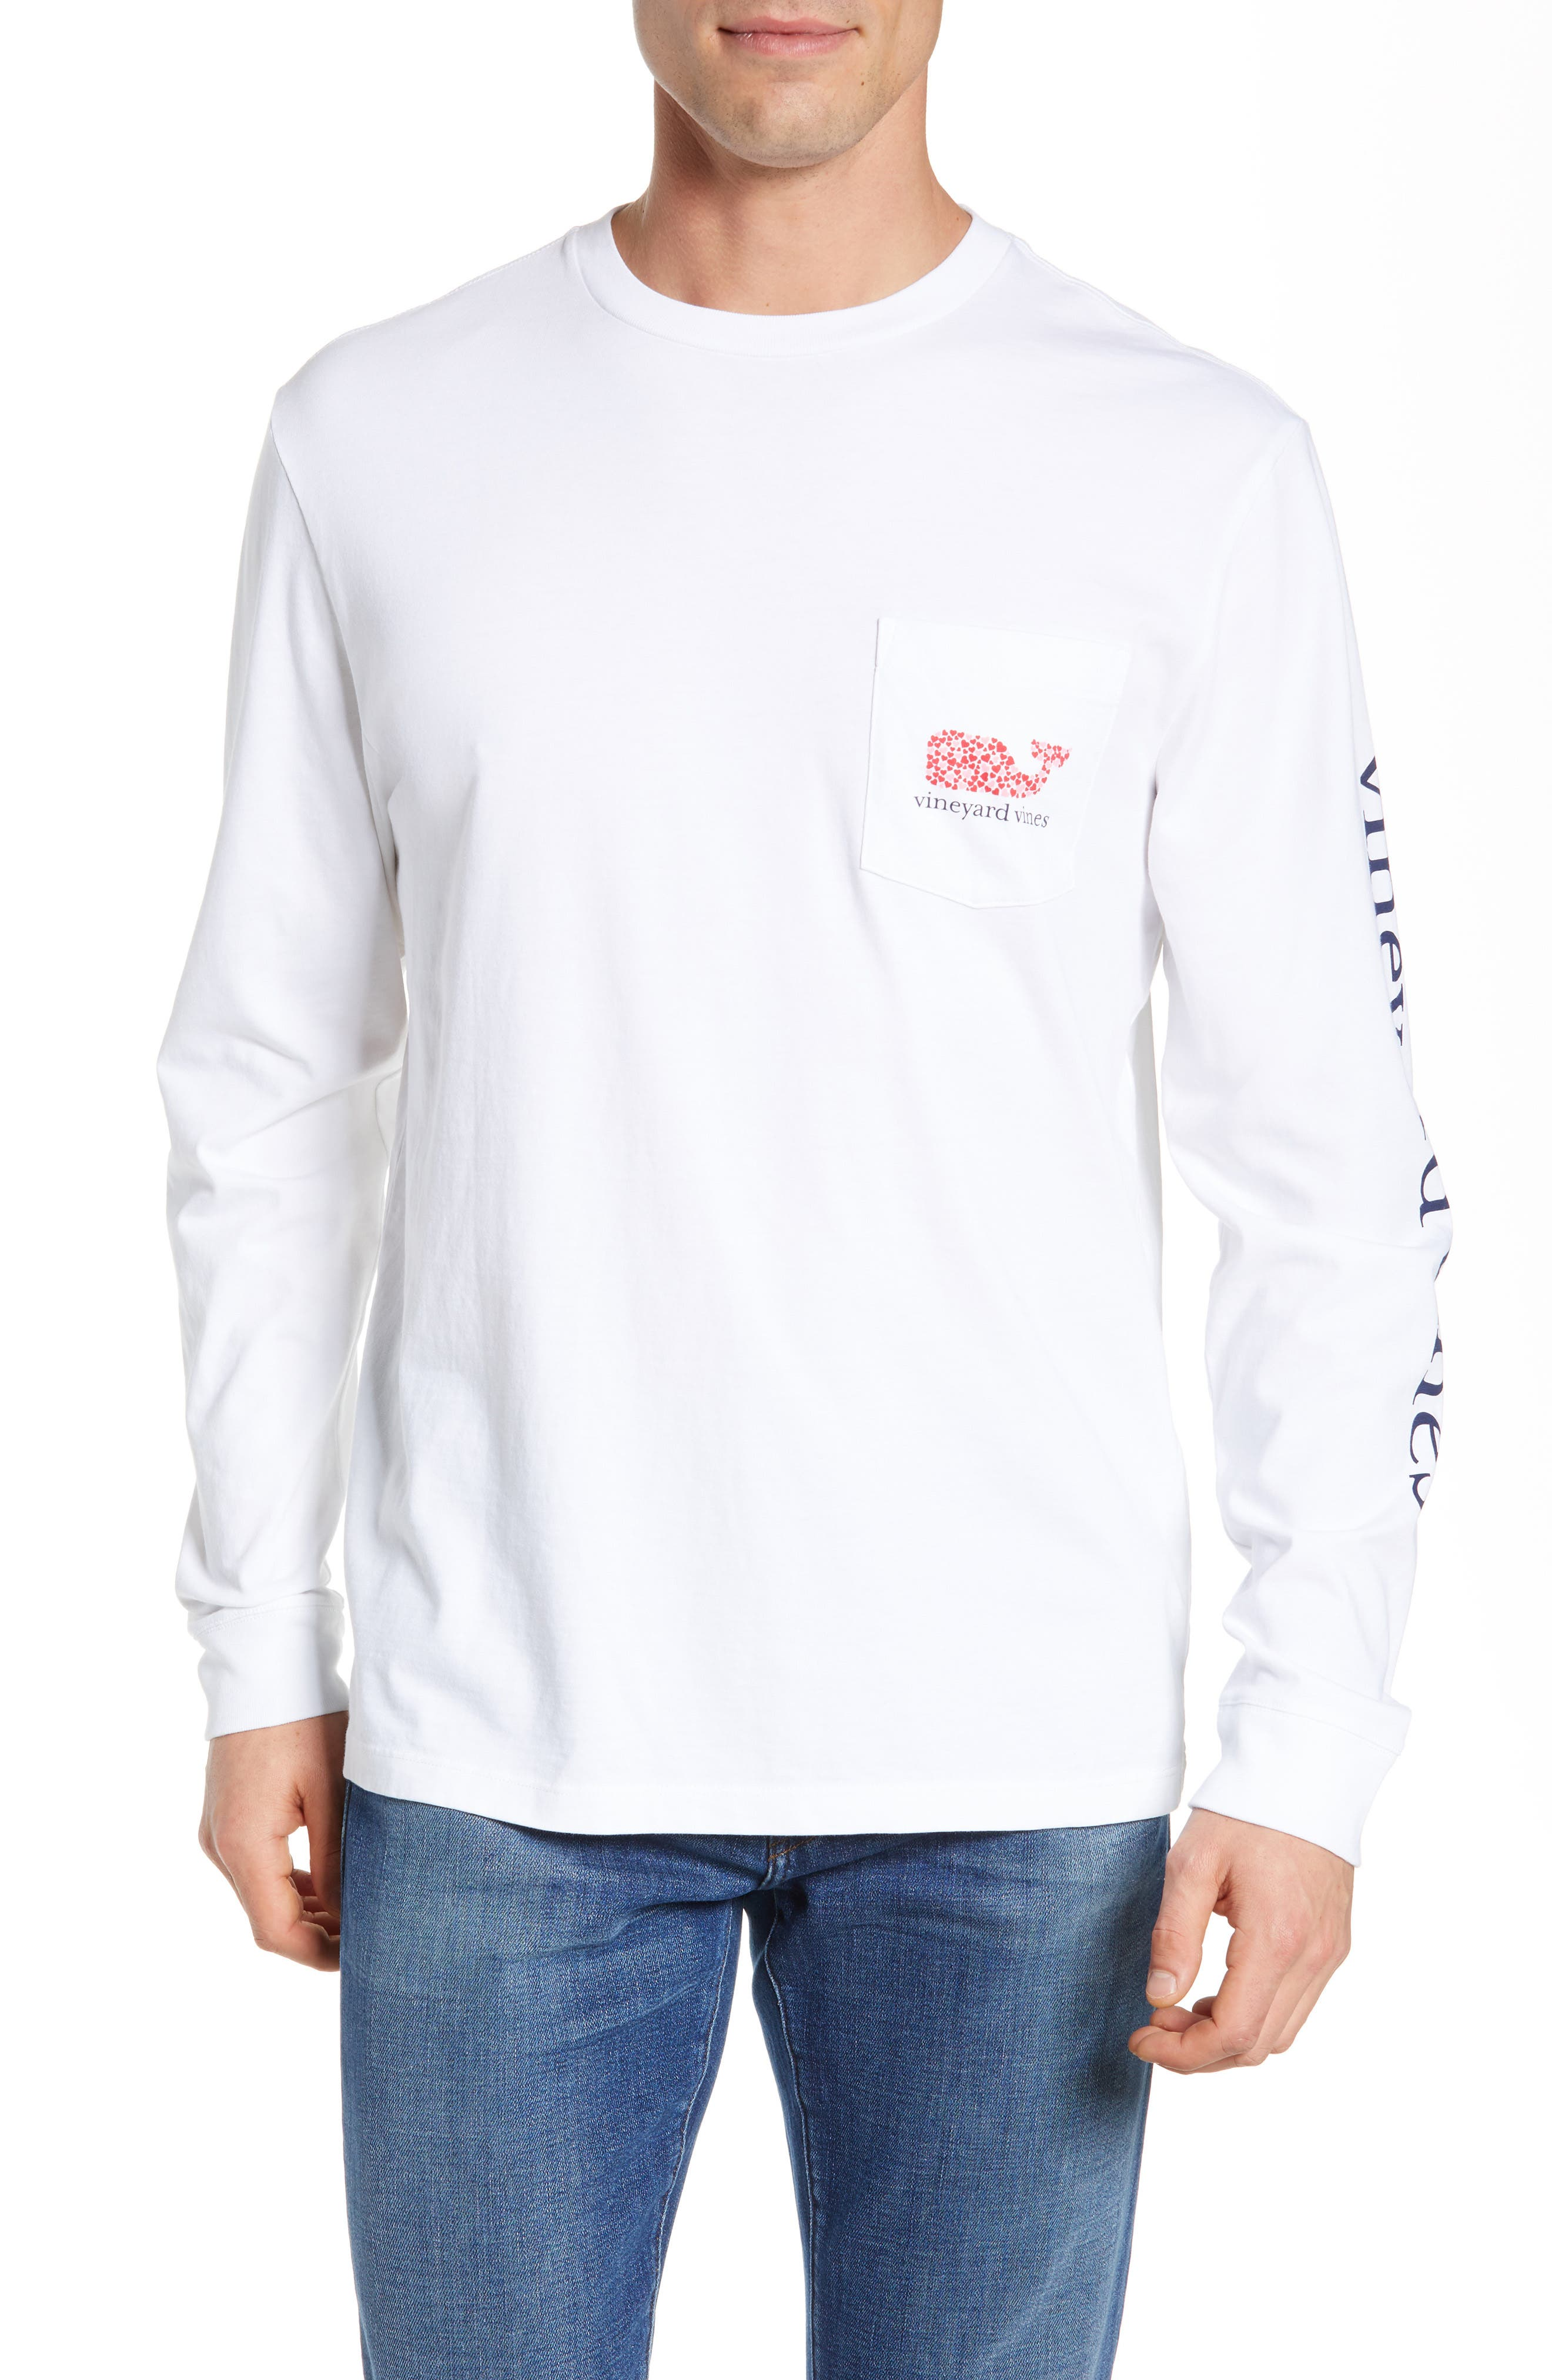 VINEYARD VINES,                             Valentine's Day Pocket T-Shirt,                             Main thumbnail 1, color,                             WHITE CAP